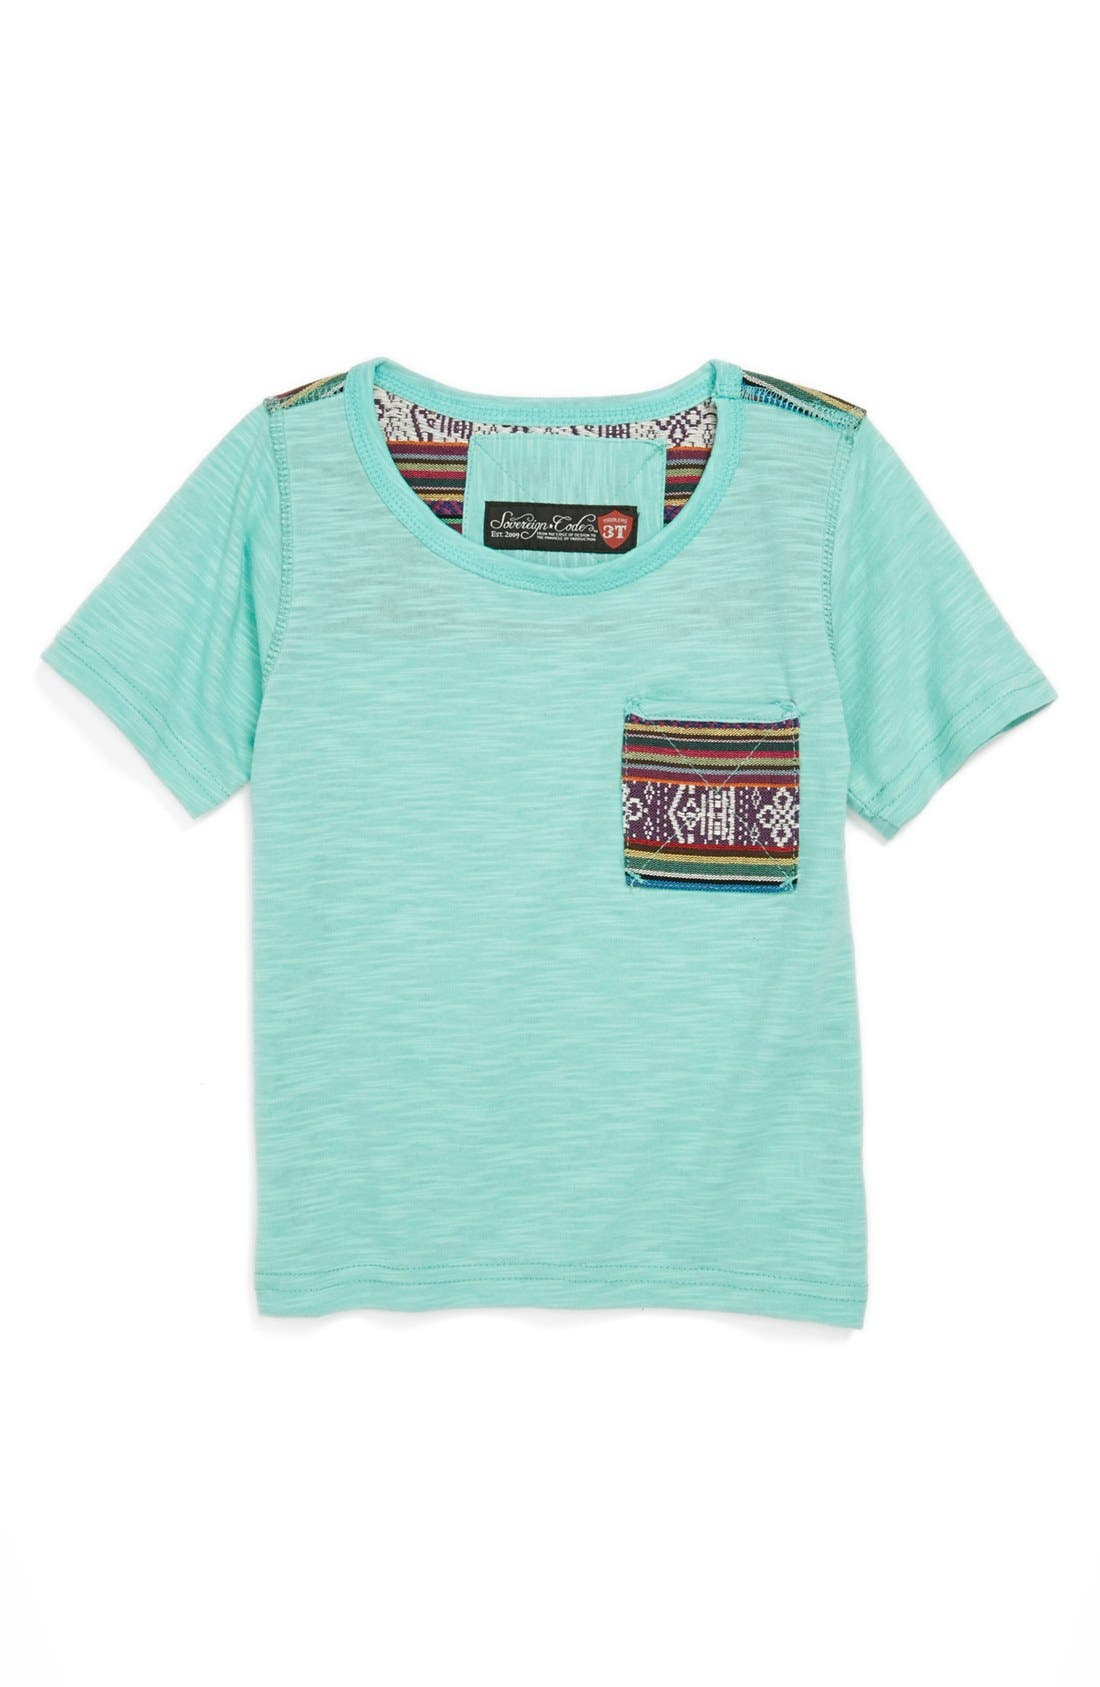 Main Image - Sovereign Code Contrast Pocket T-Shirt (Toddler Boys)